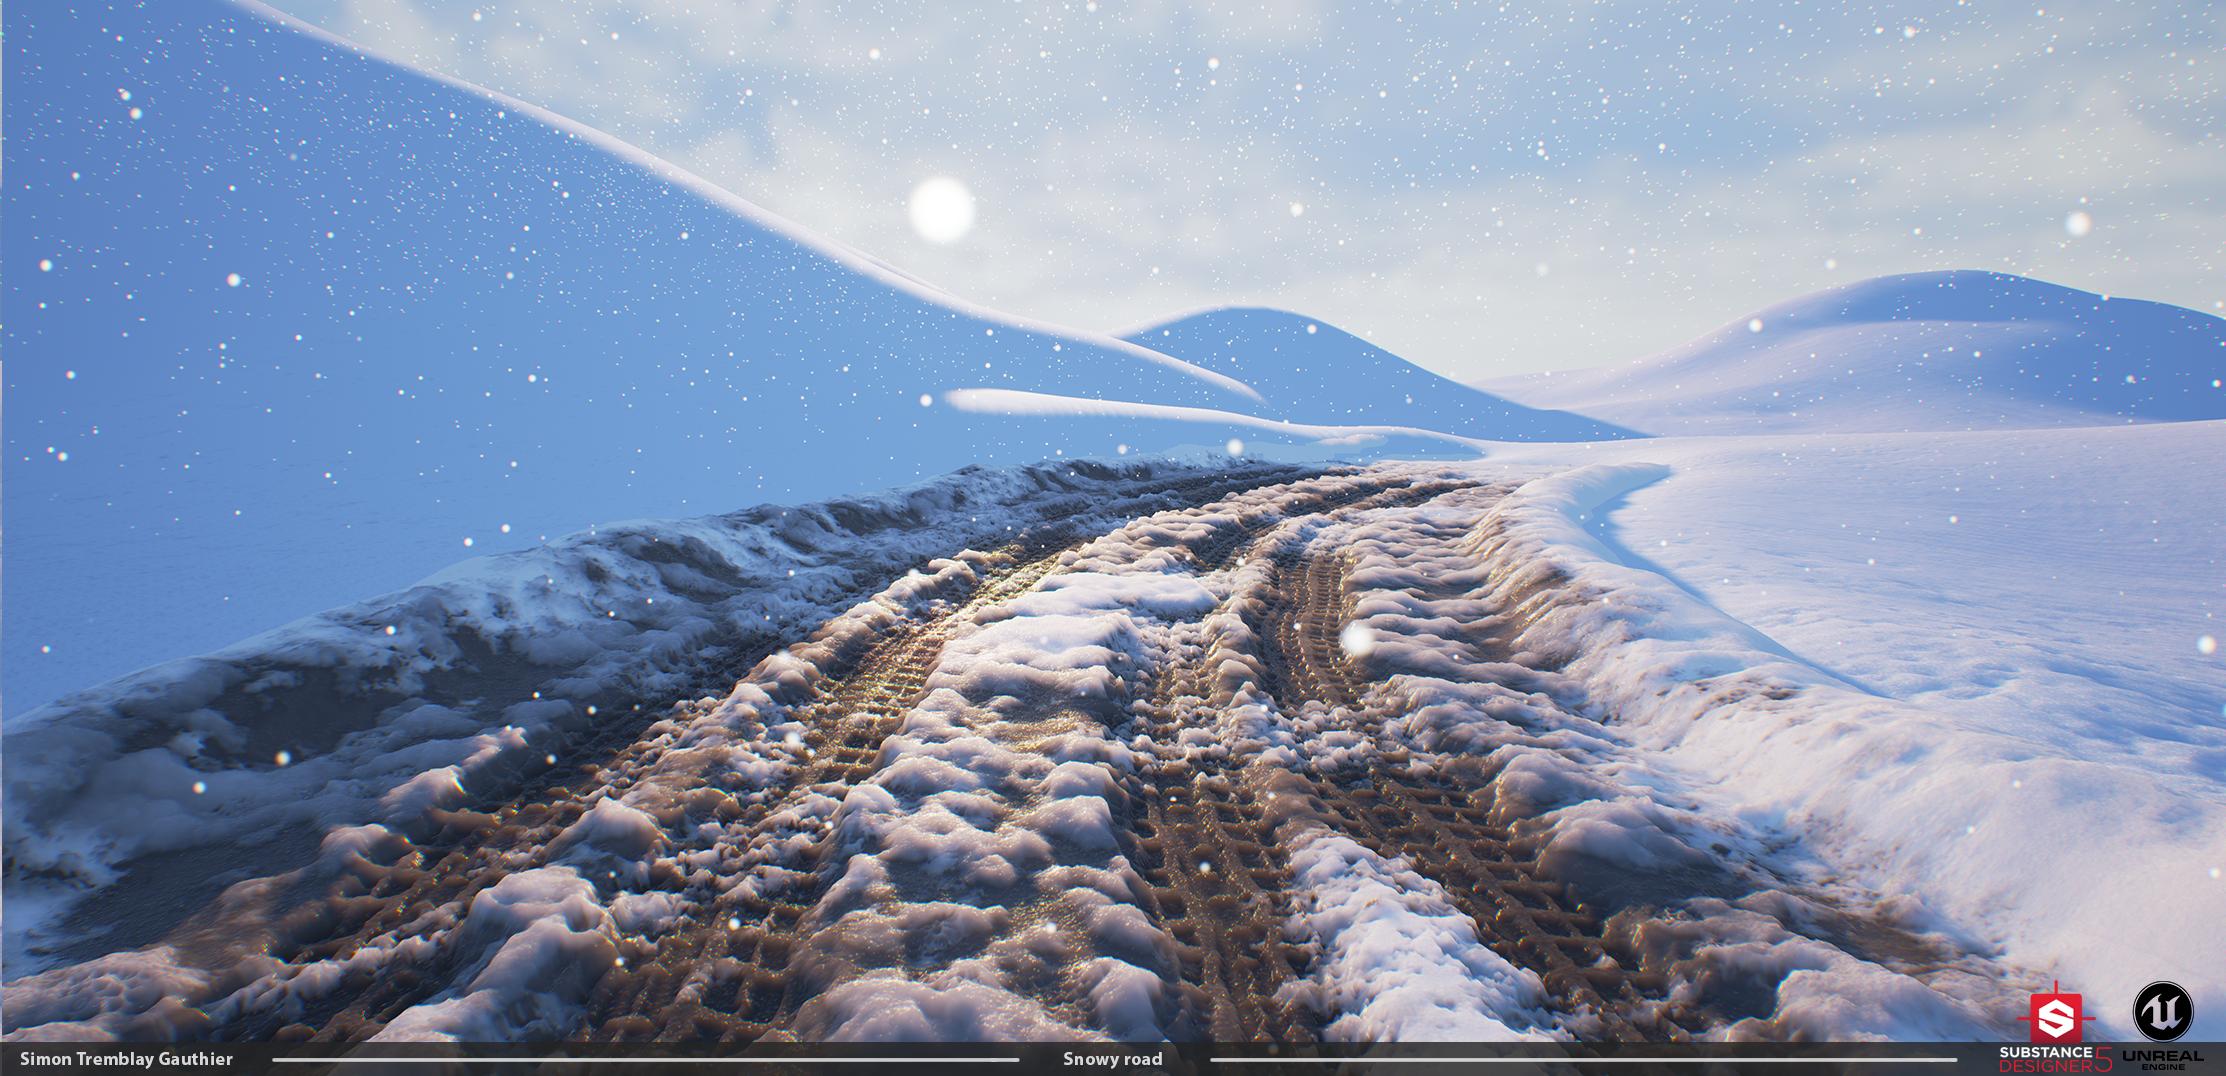 Substance/UE4] - Snow road scene — polycount